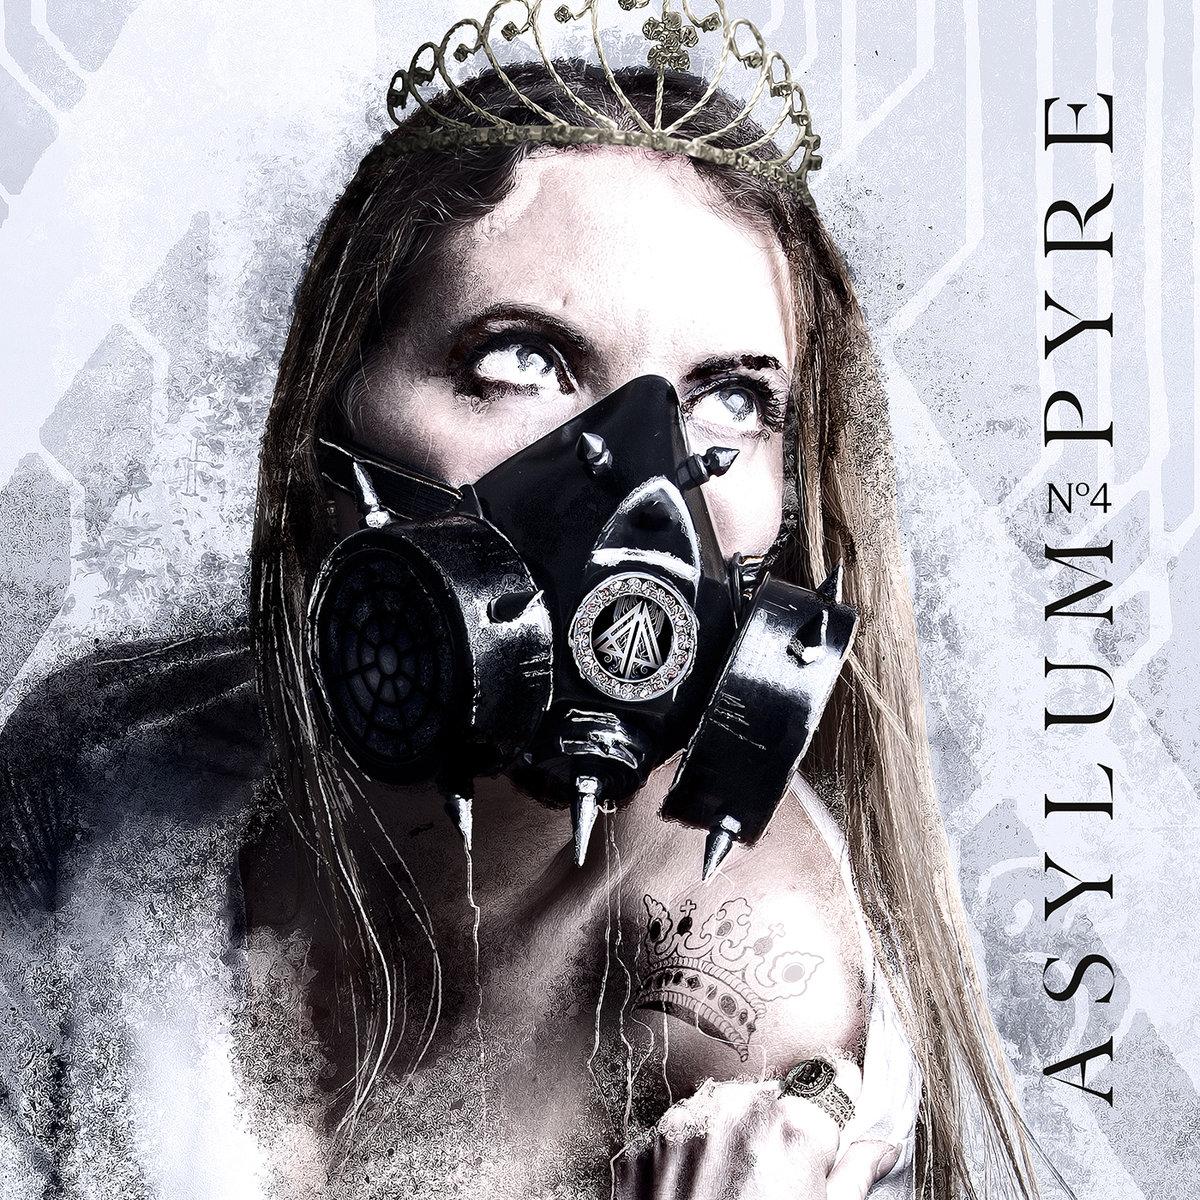 asylum-pyre-n4-album-review